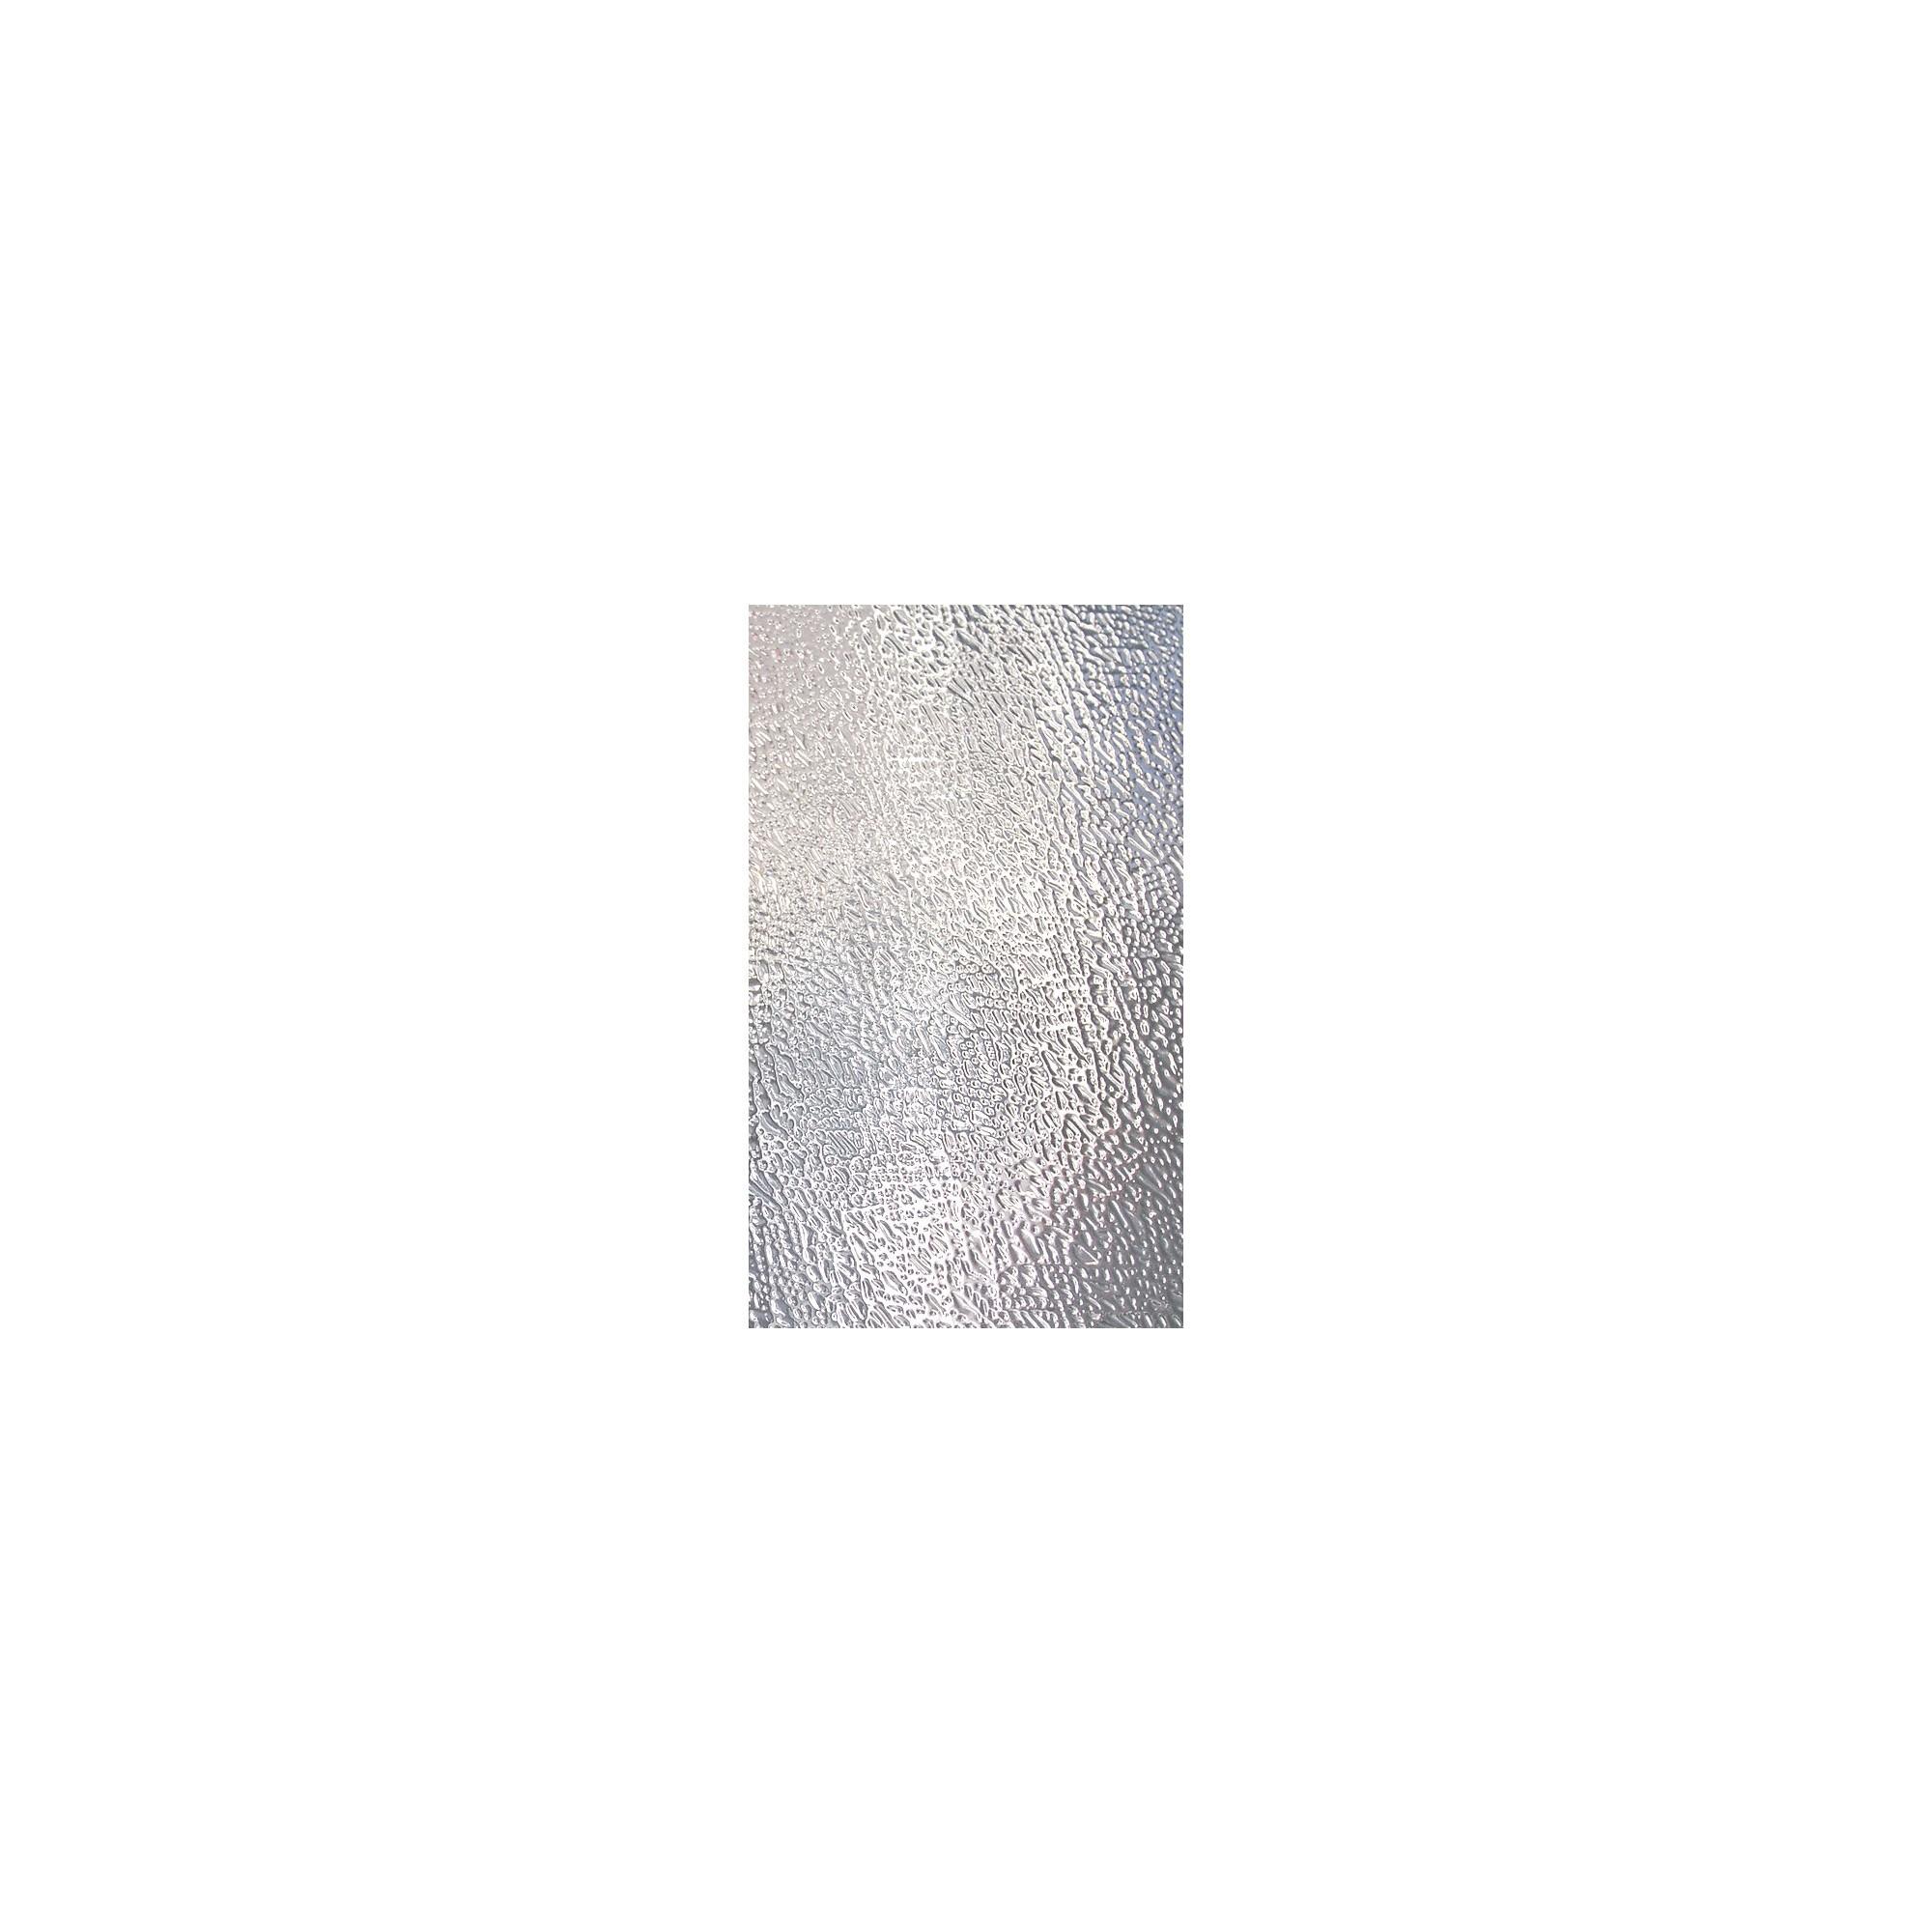 'Artscape Texture 12 Window Film 24'' x 36'''